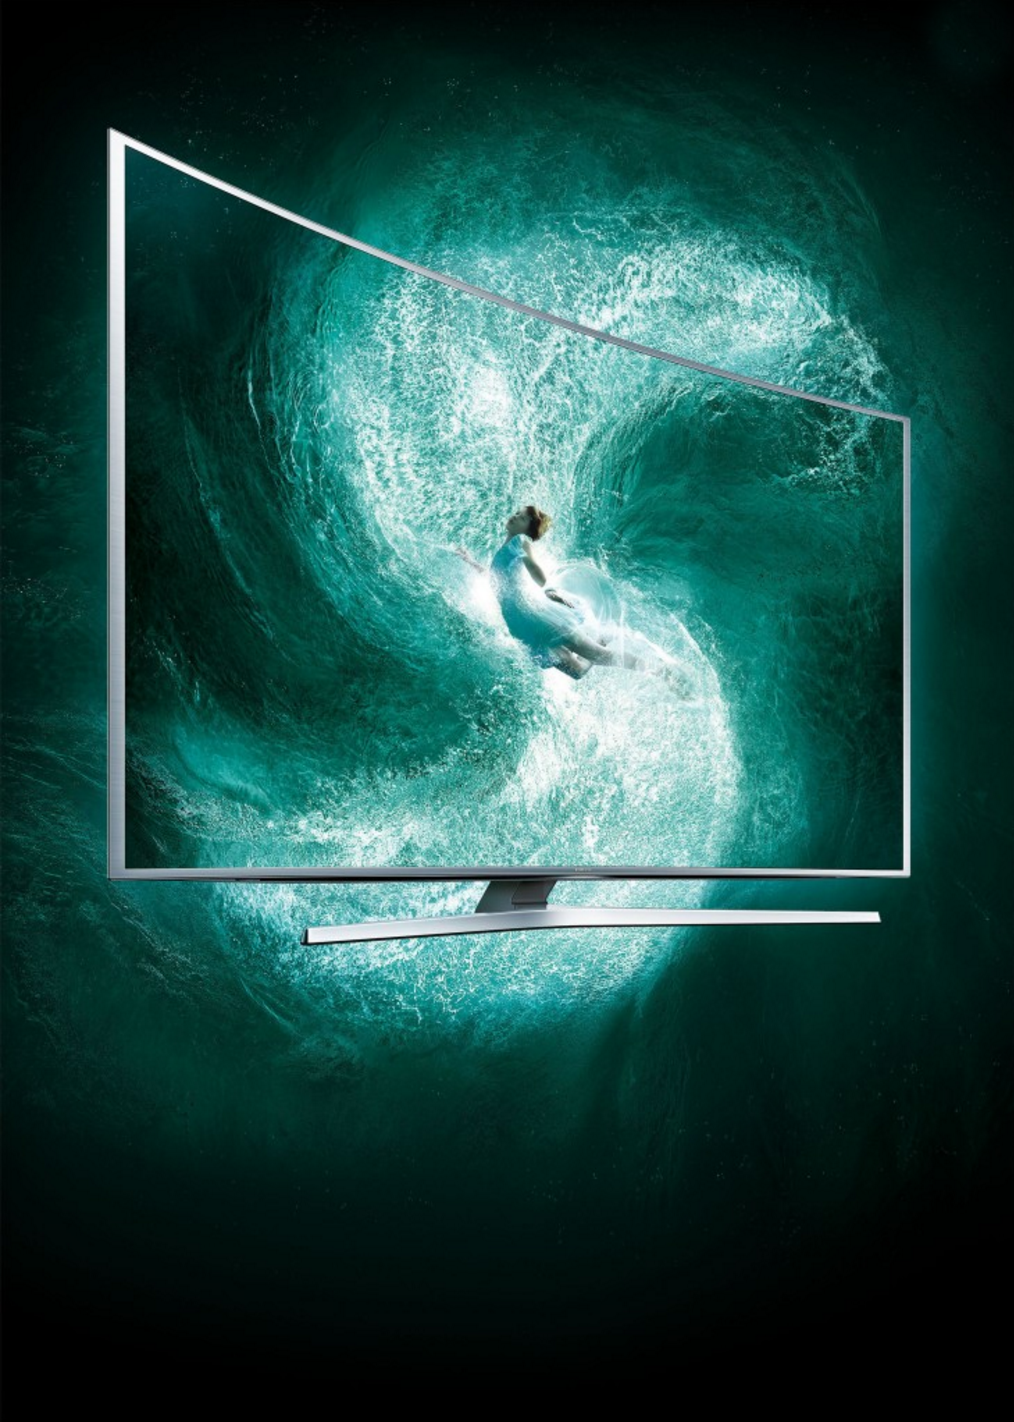 Samsung TV Dynamic – Waves